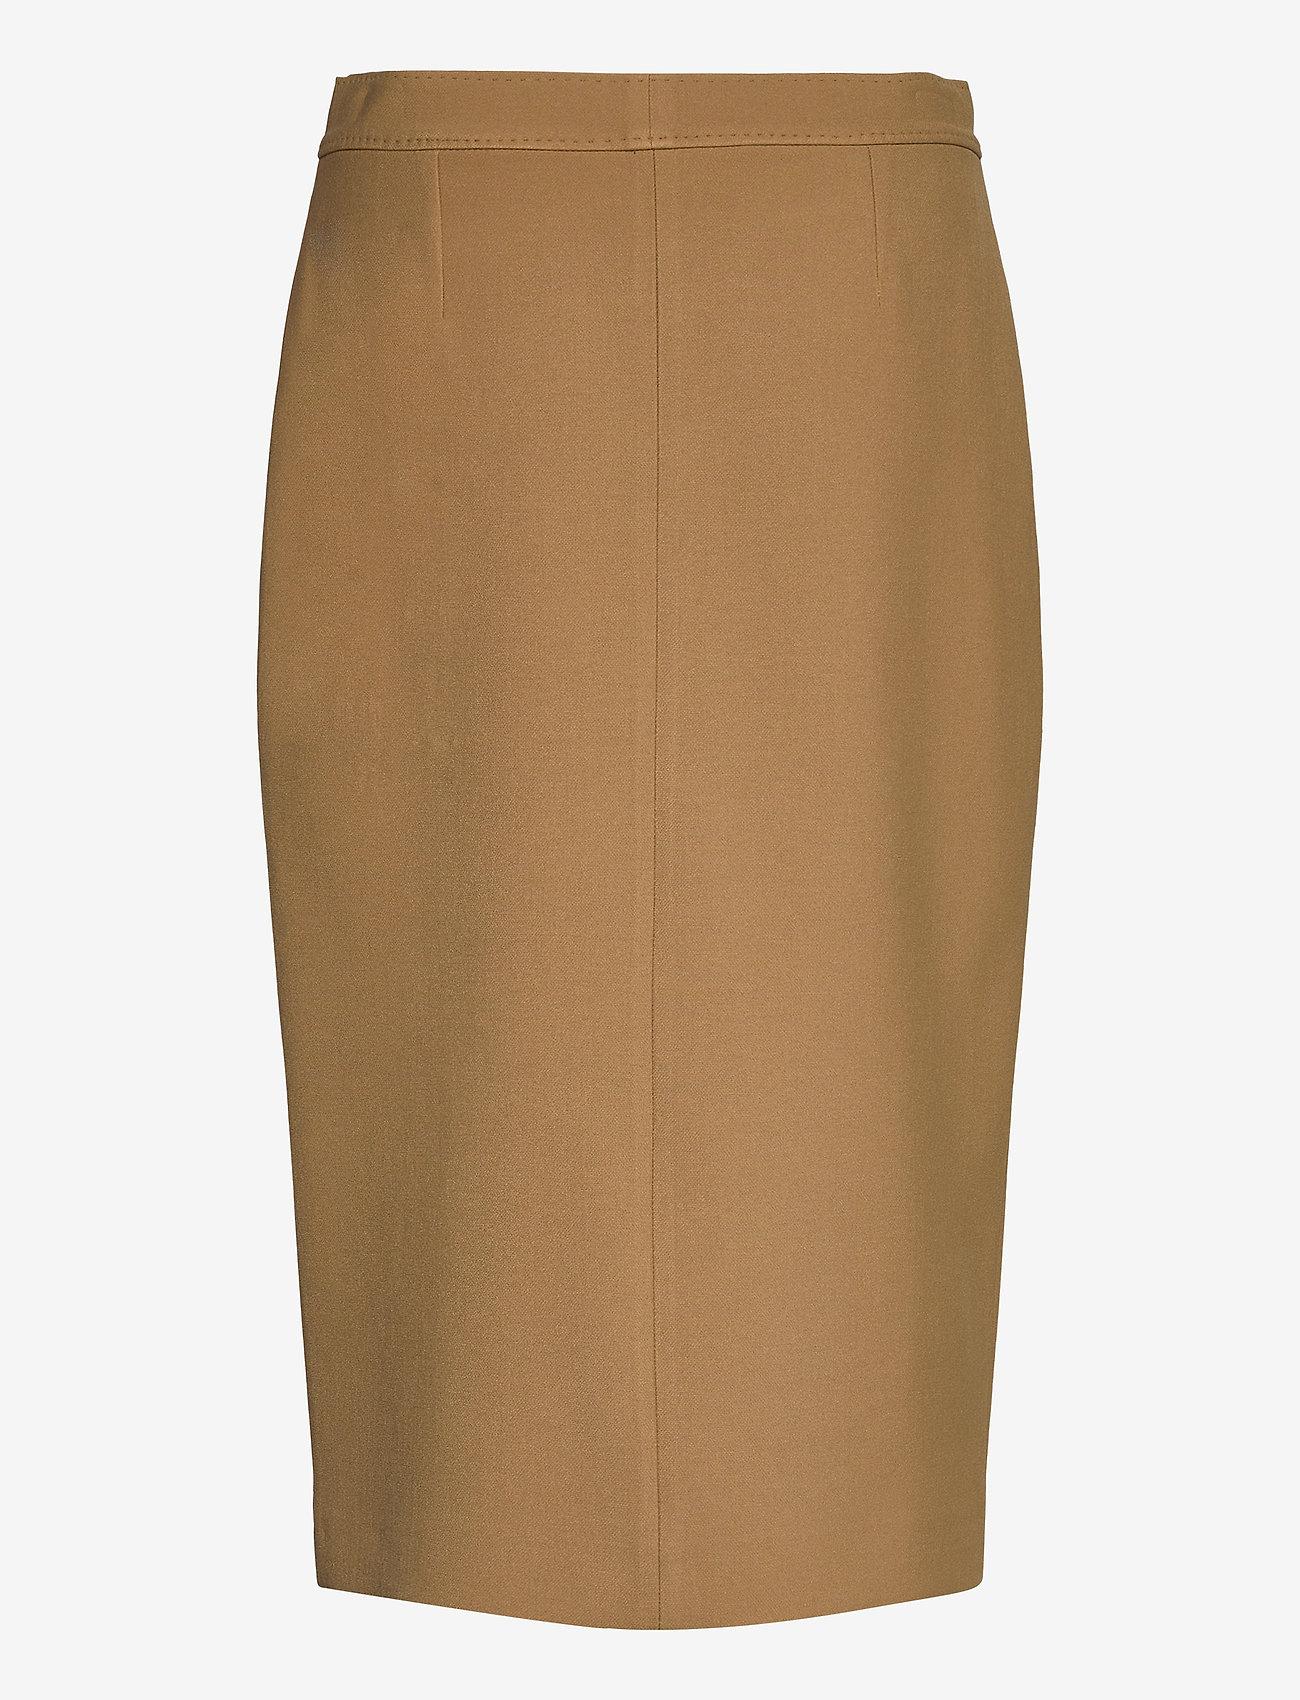 SAND - 3596 - Aidith - midi kjolar - light camel - 1